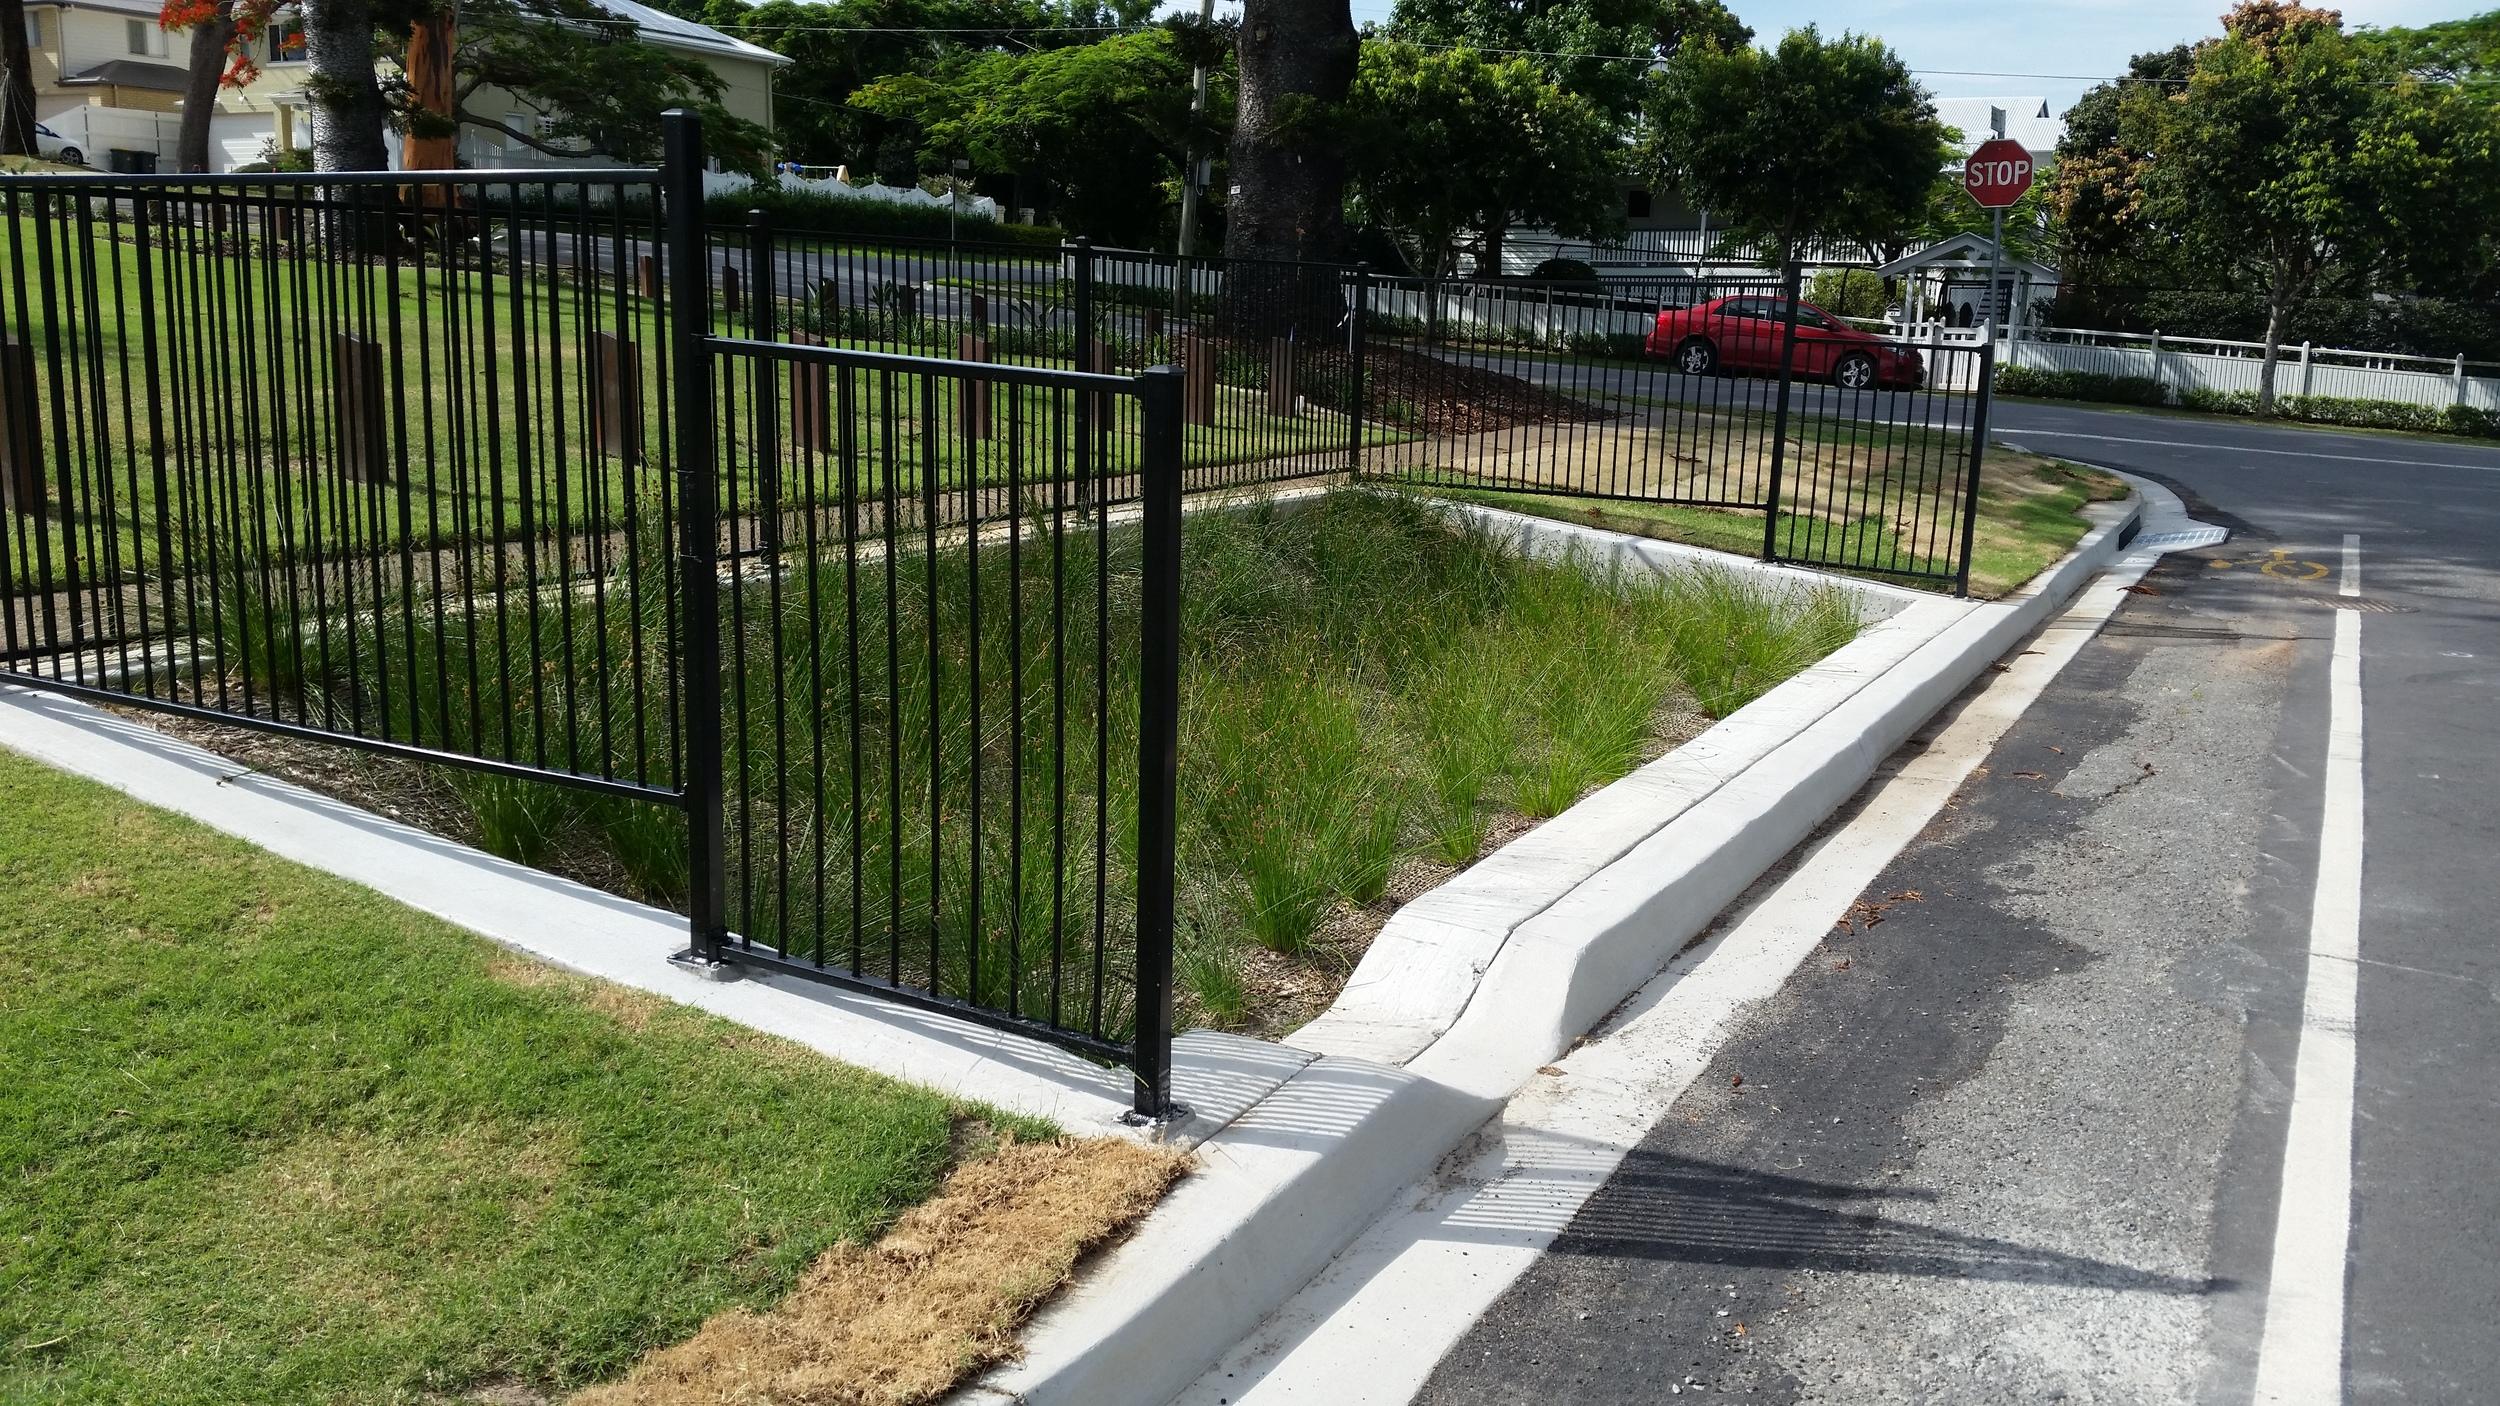 Keble St Bioretention System